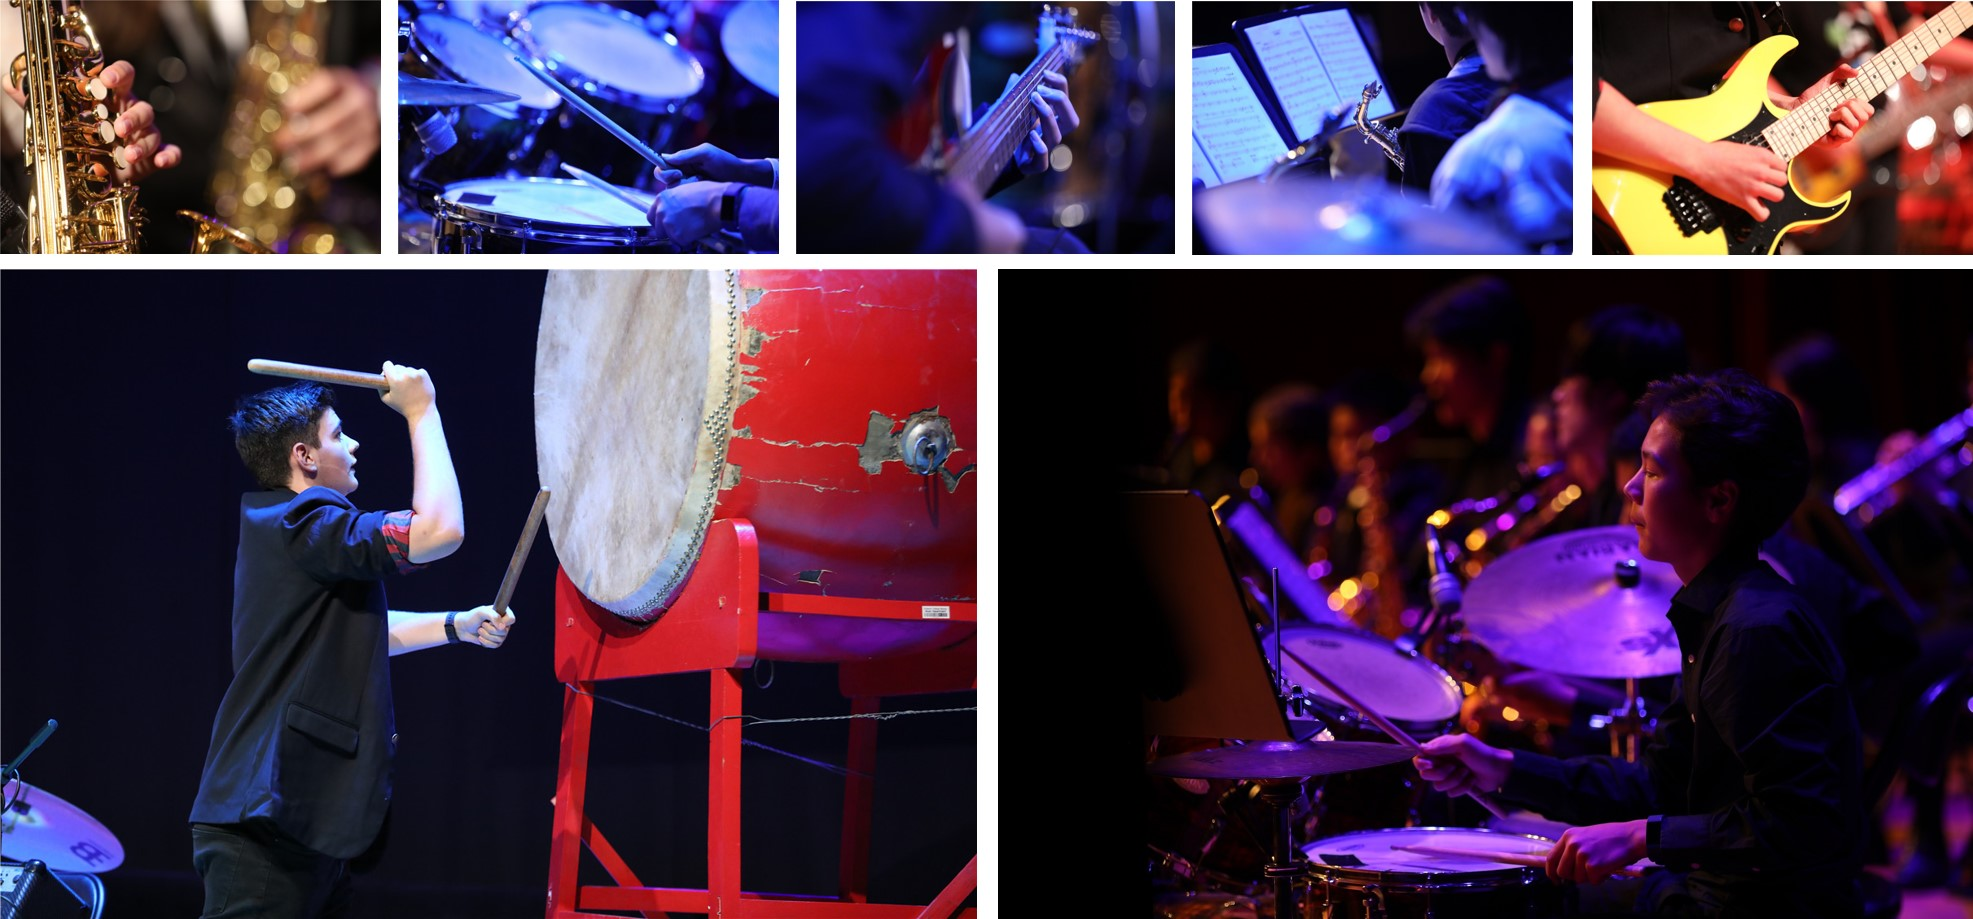 dfm-at-dcb-2019-instruments-北京德威英国国际学校